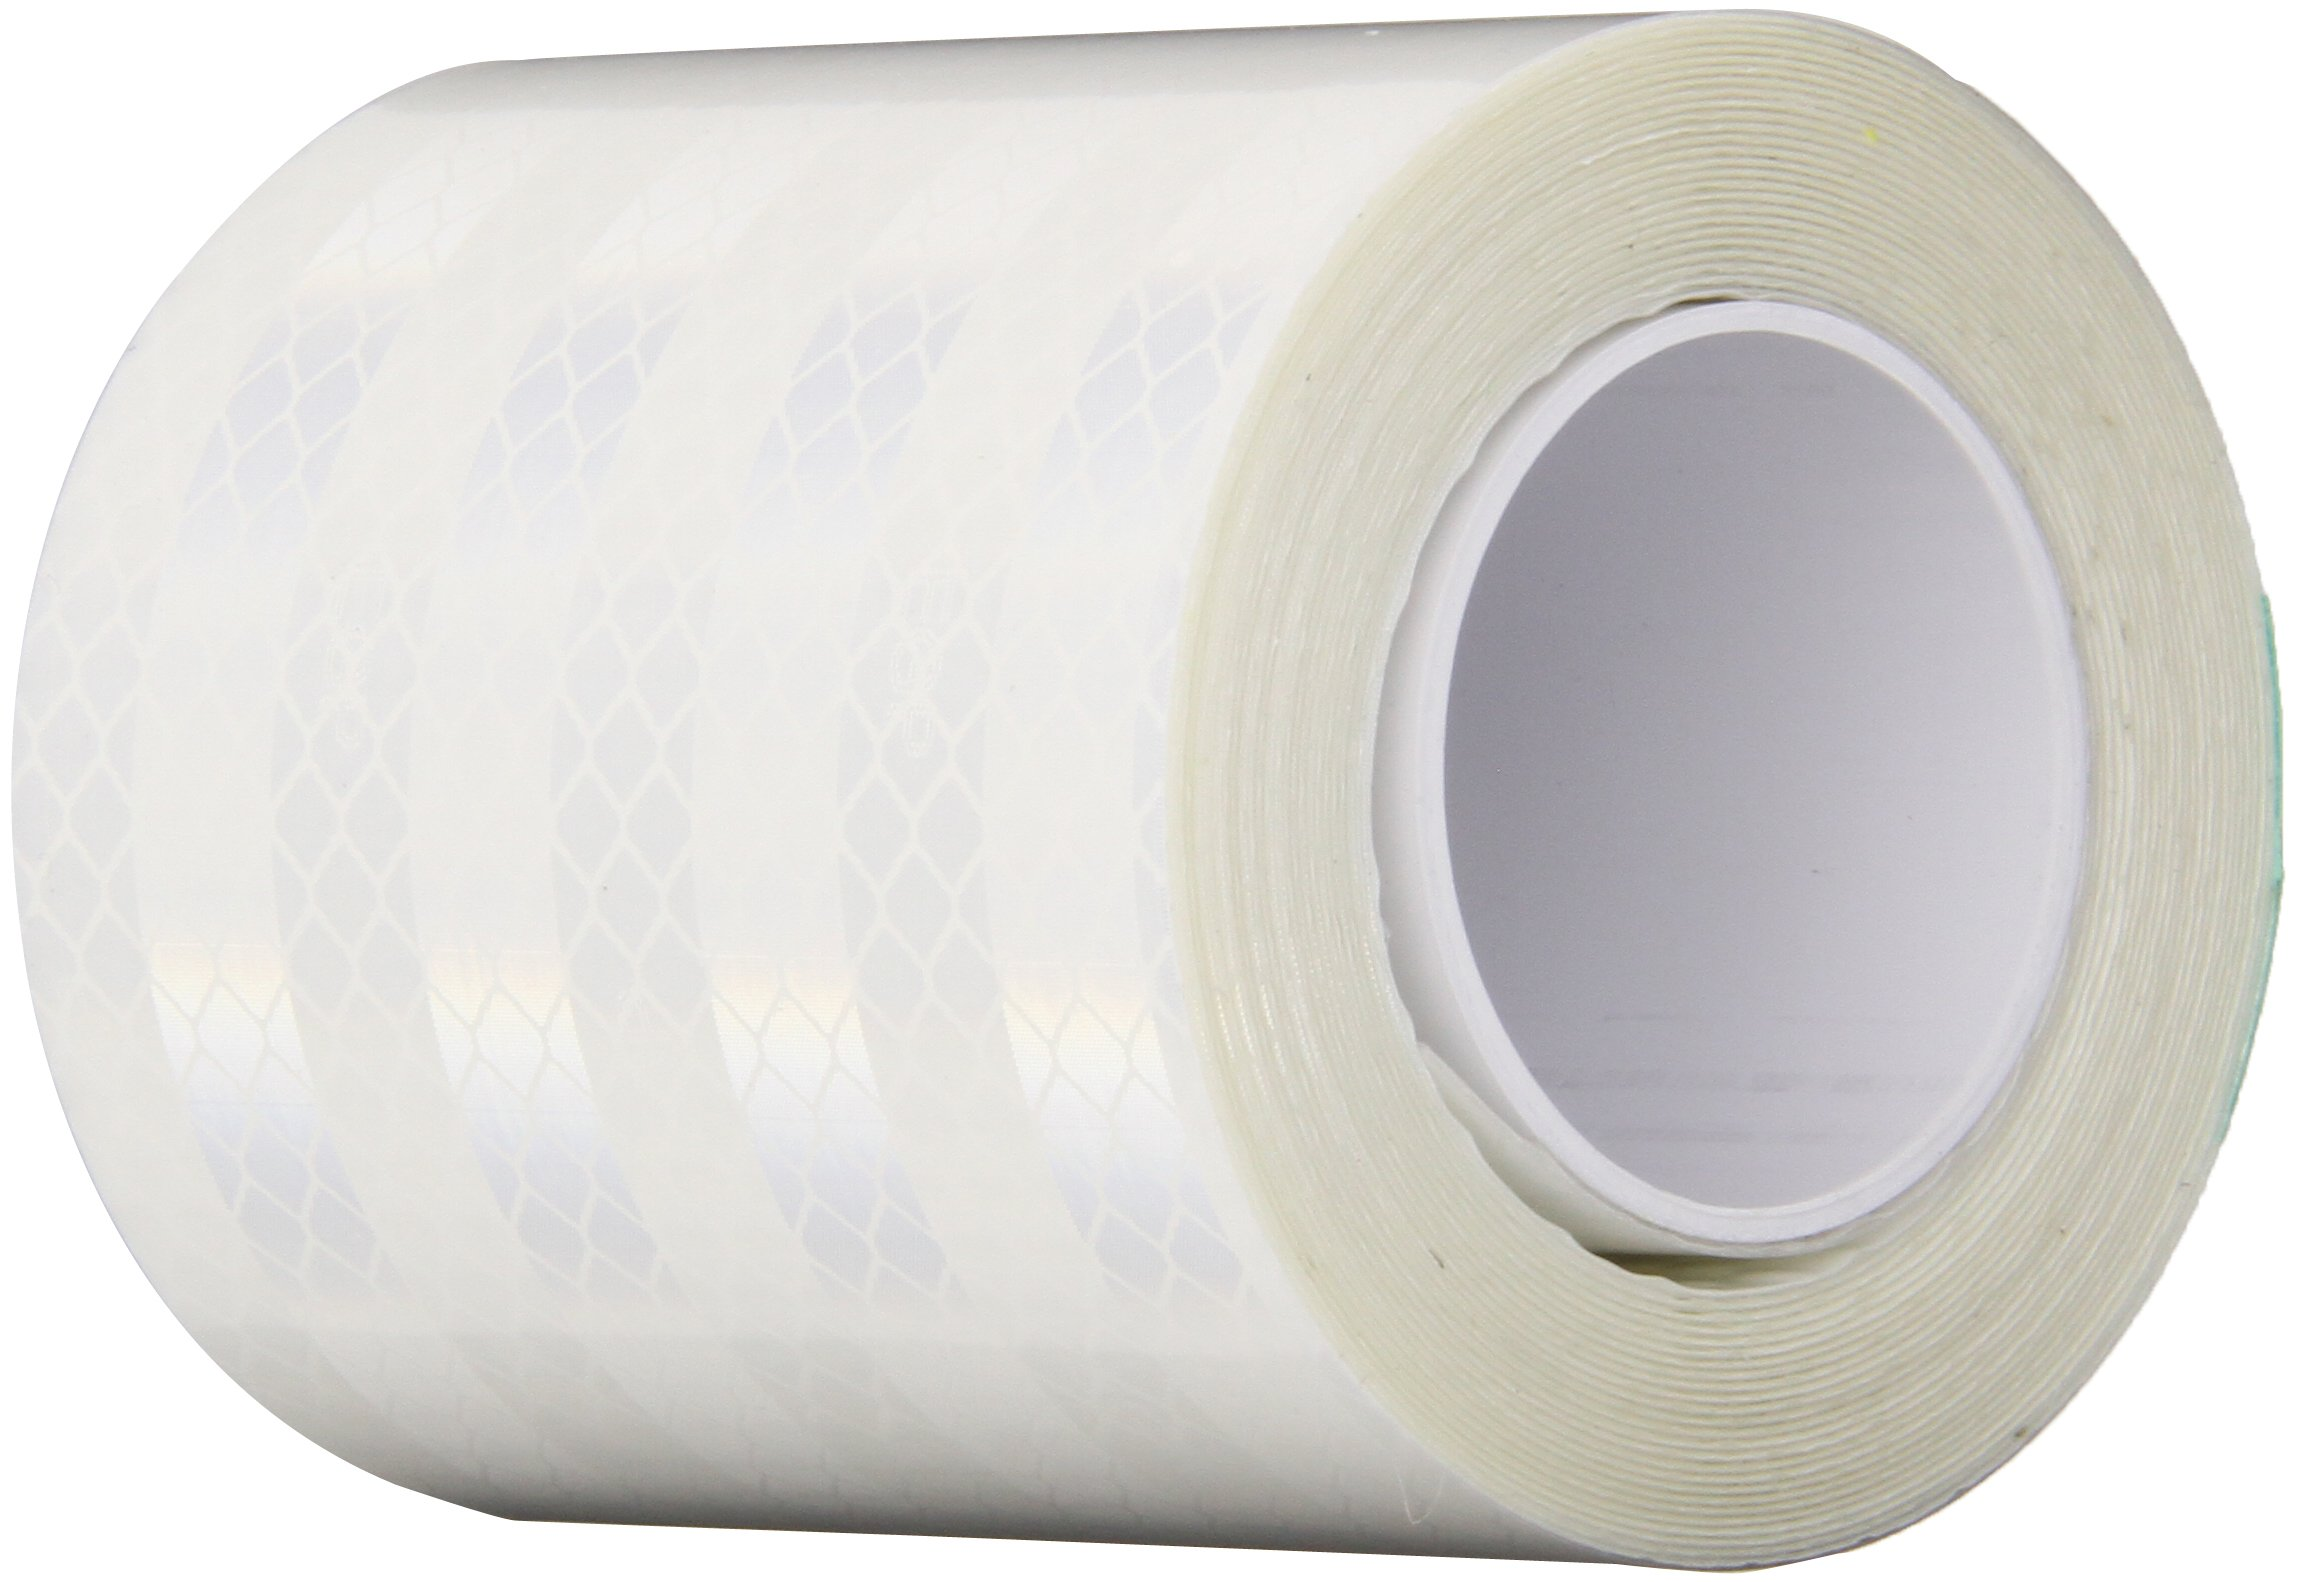 "3M 3290 White Reflective Tape, 3"" width x 5yd"